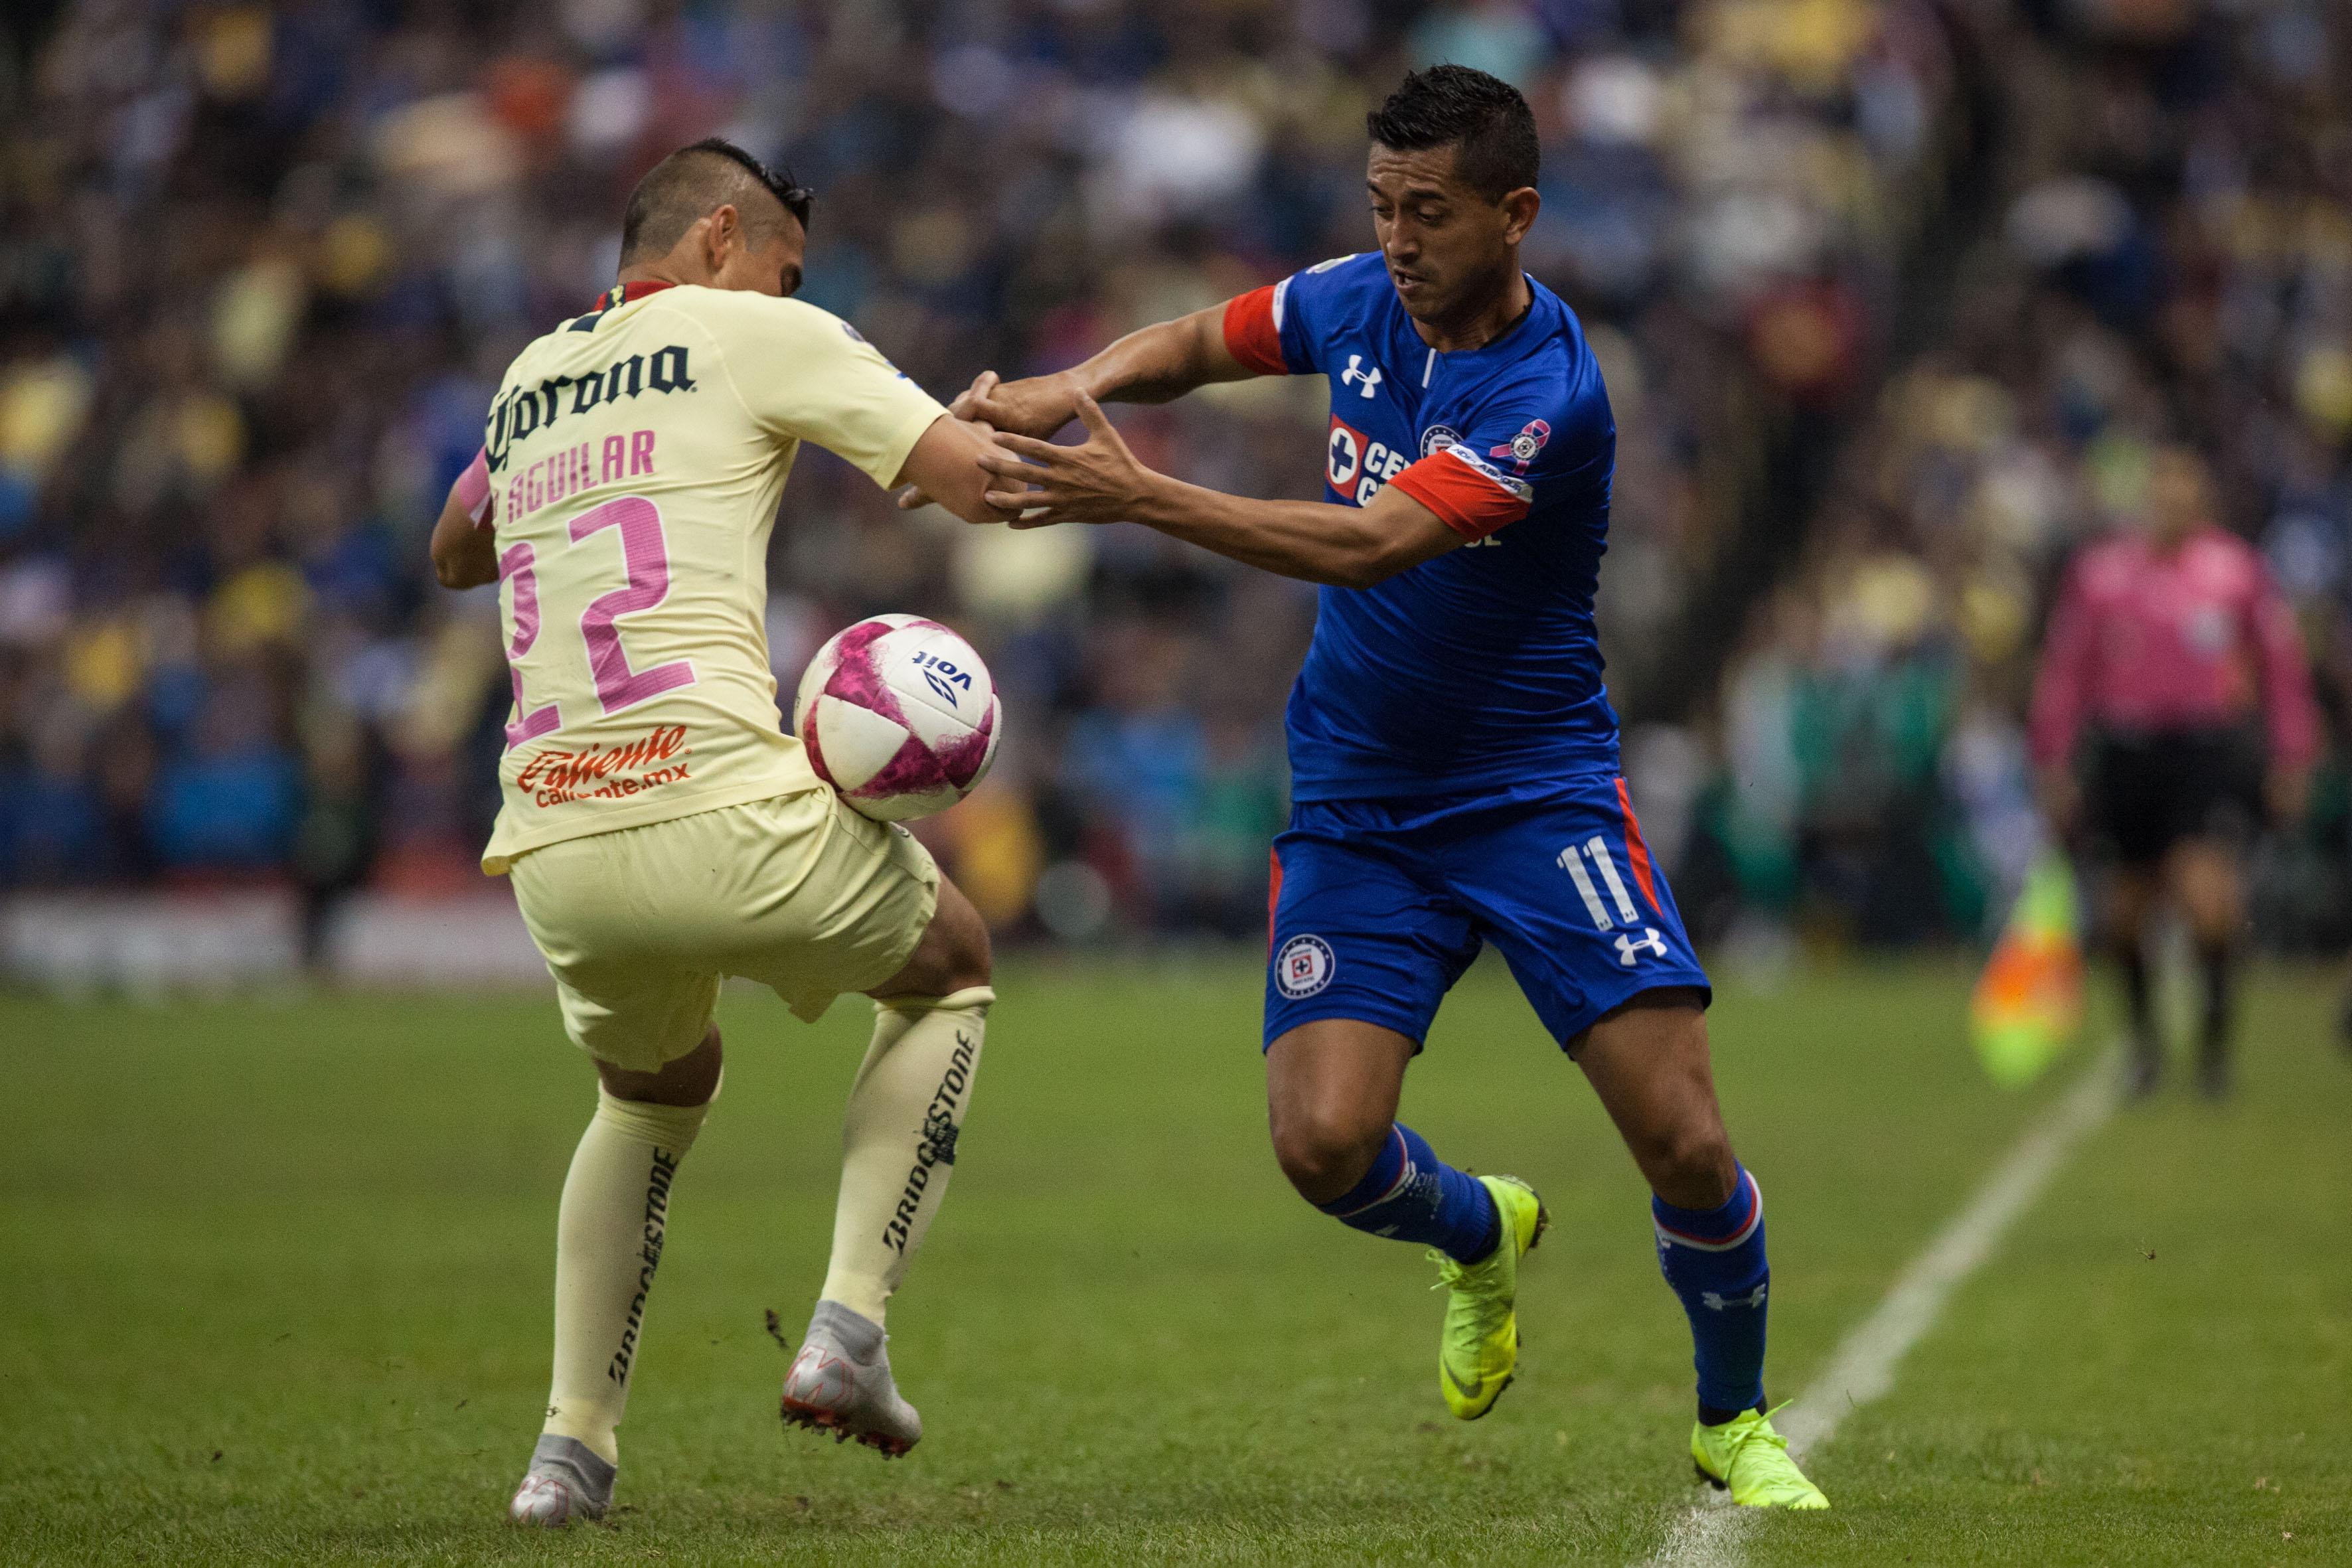 Club America Will Face Cruz Azul In Liga Mx Final For Historic Fourth Time